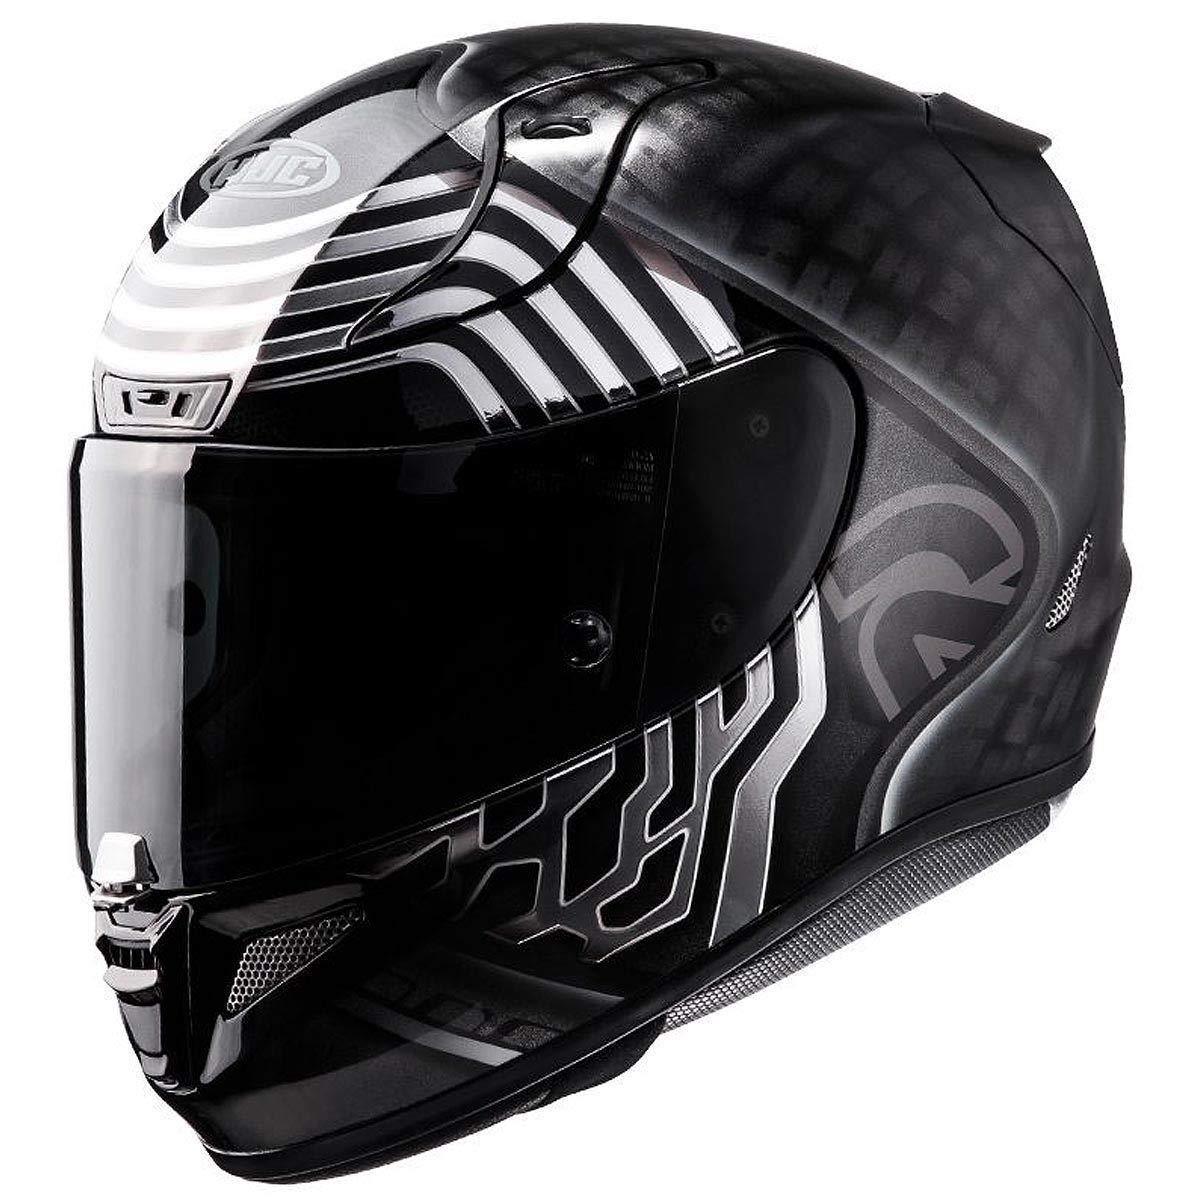 Black//Silver, Large HJC Helmets Unisex-Adult Full-Face-Helmet-Style Pro Kylo Ren Motorcycle Helmet